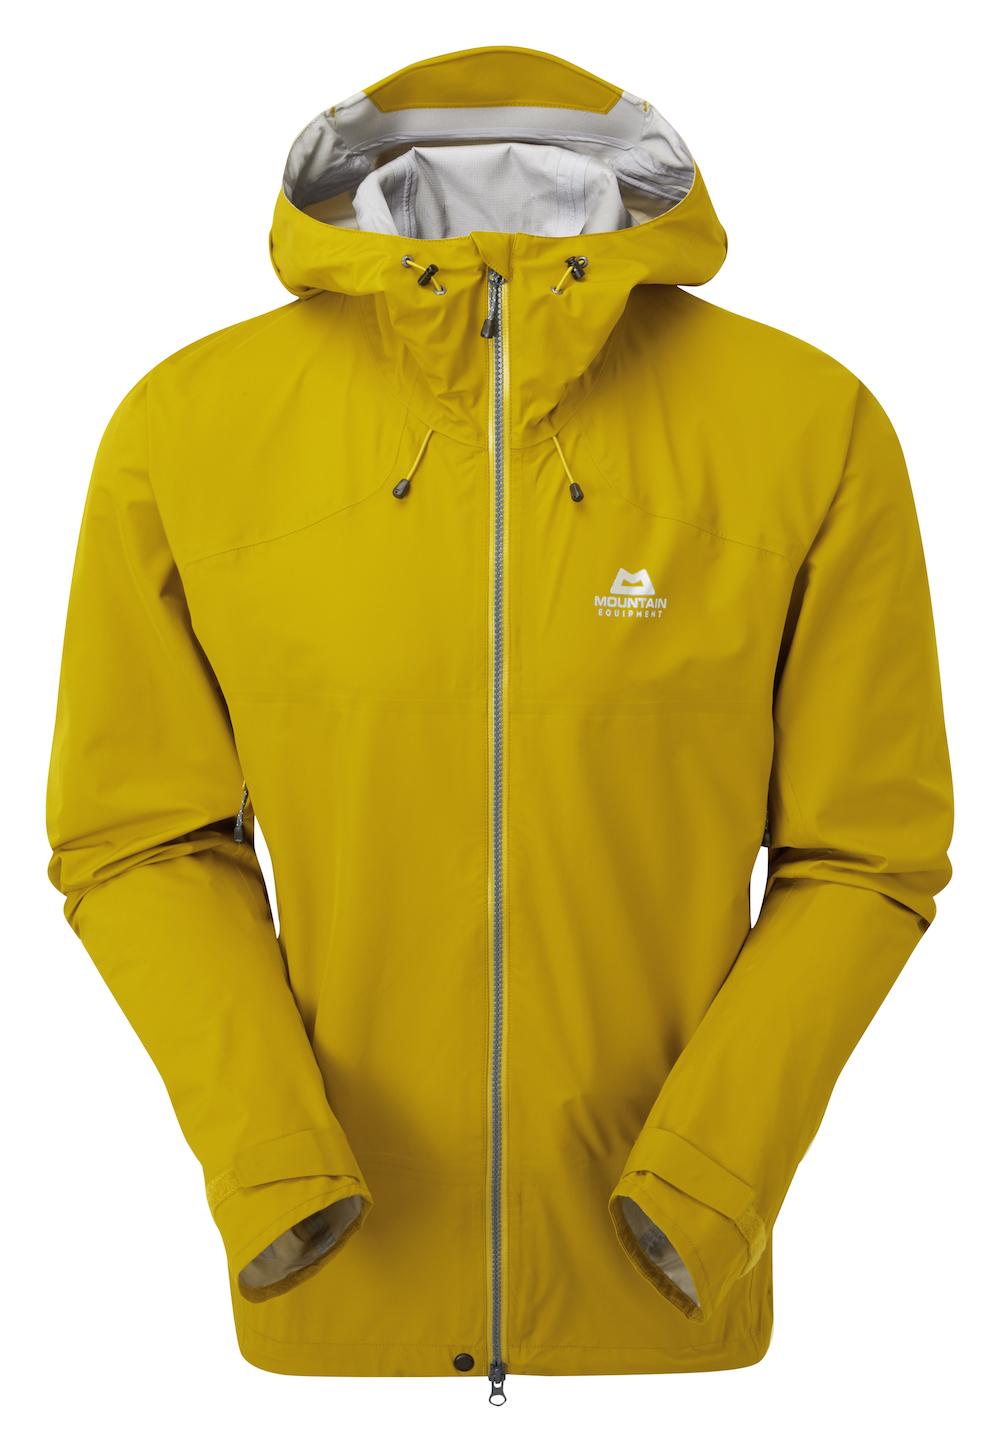 Mountain Equipment Odyssey Jacket - Hardshell jacket - Men's